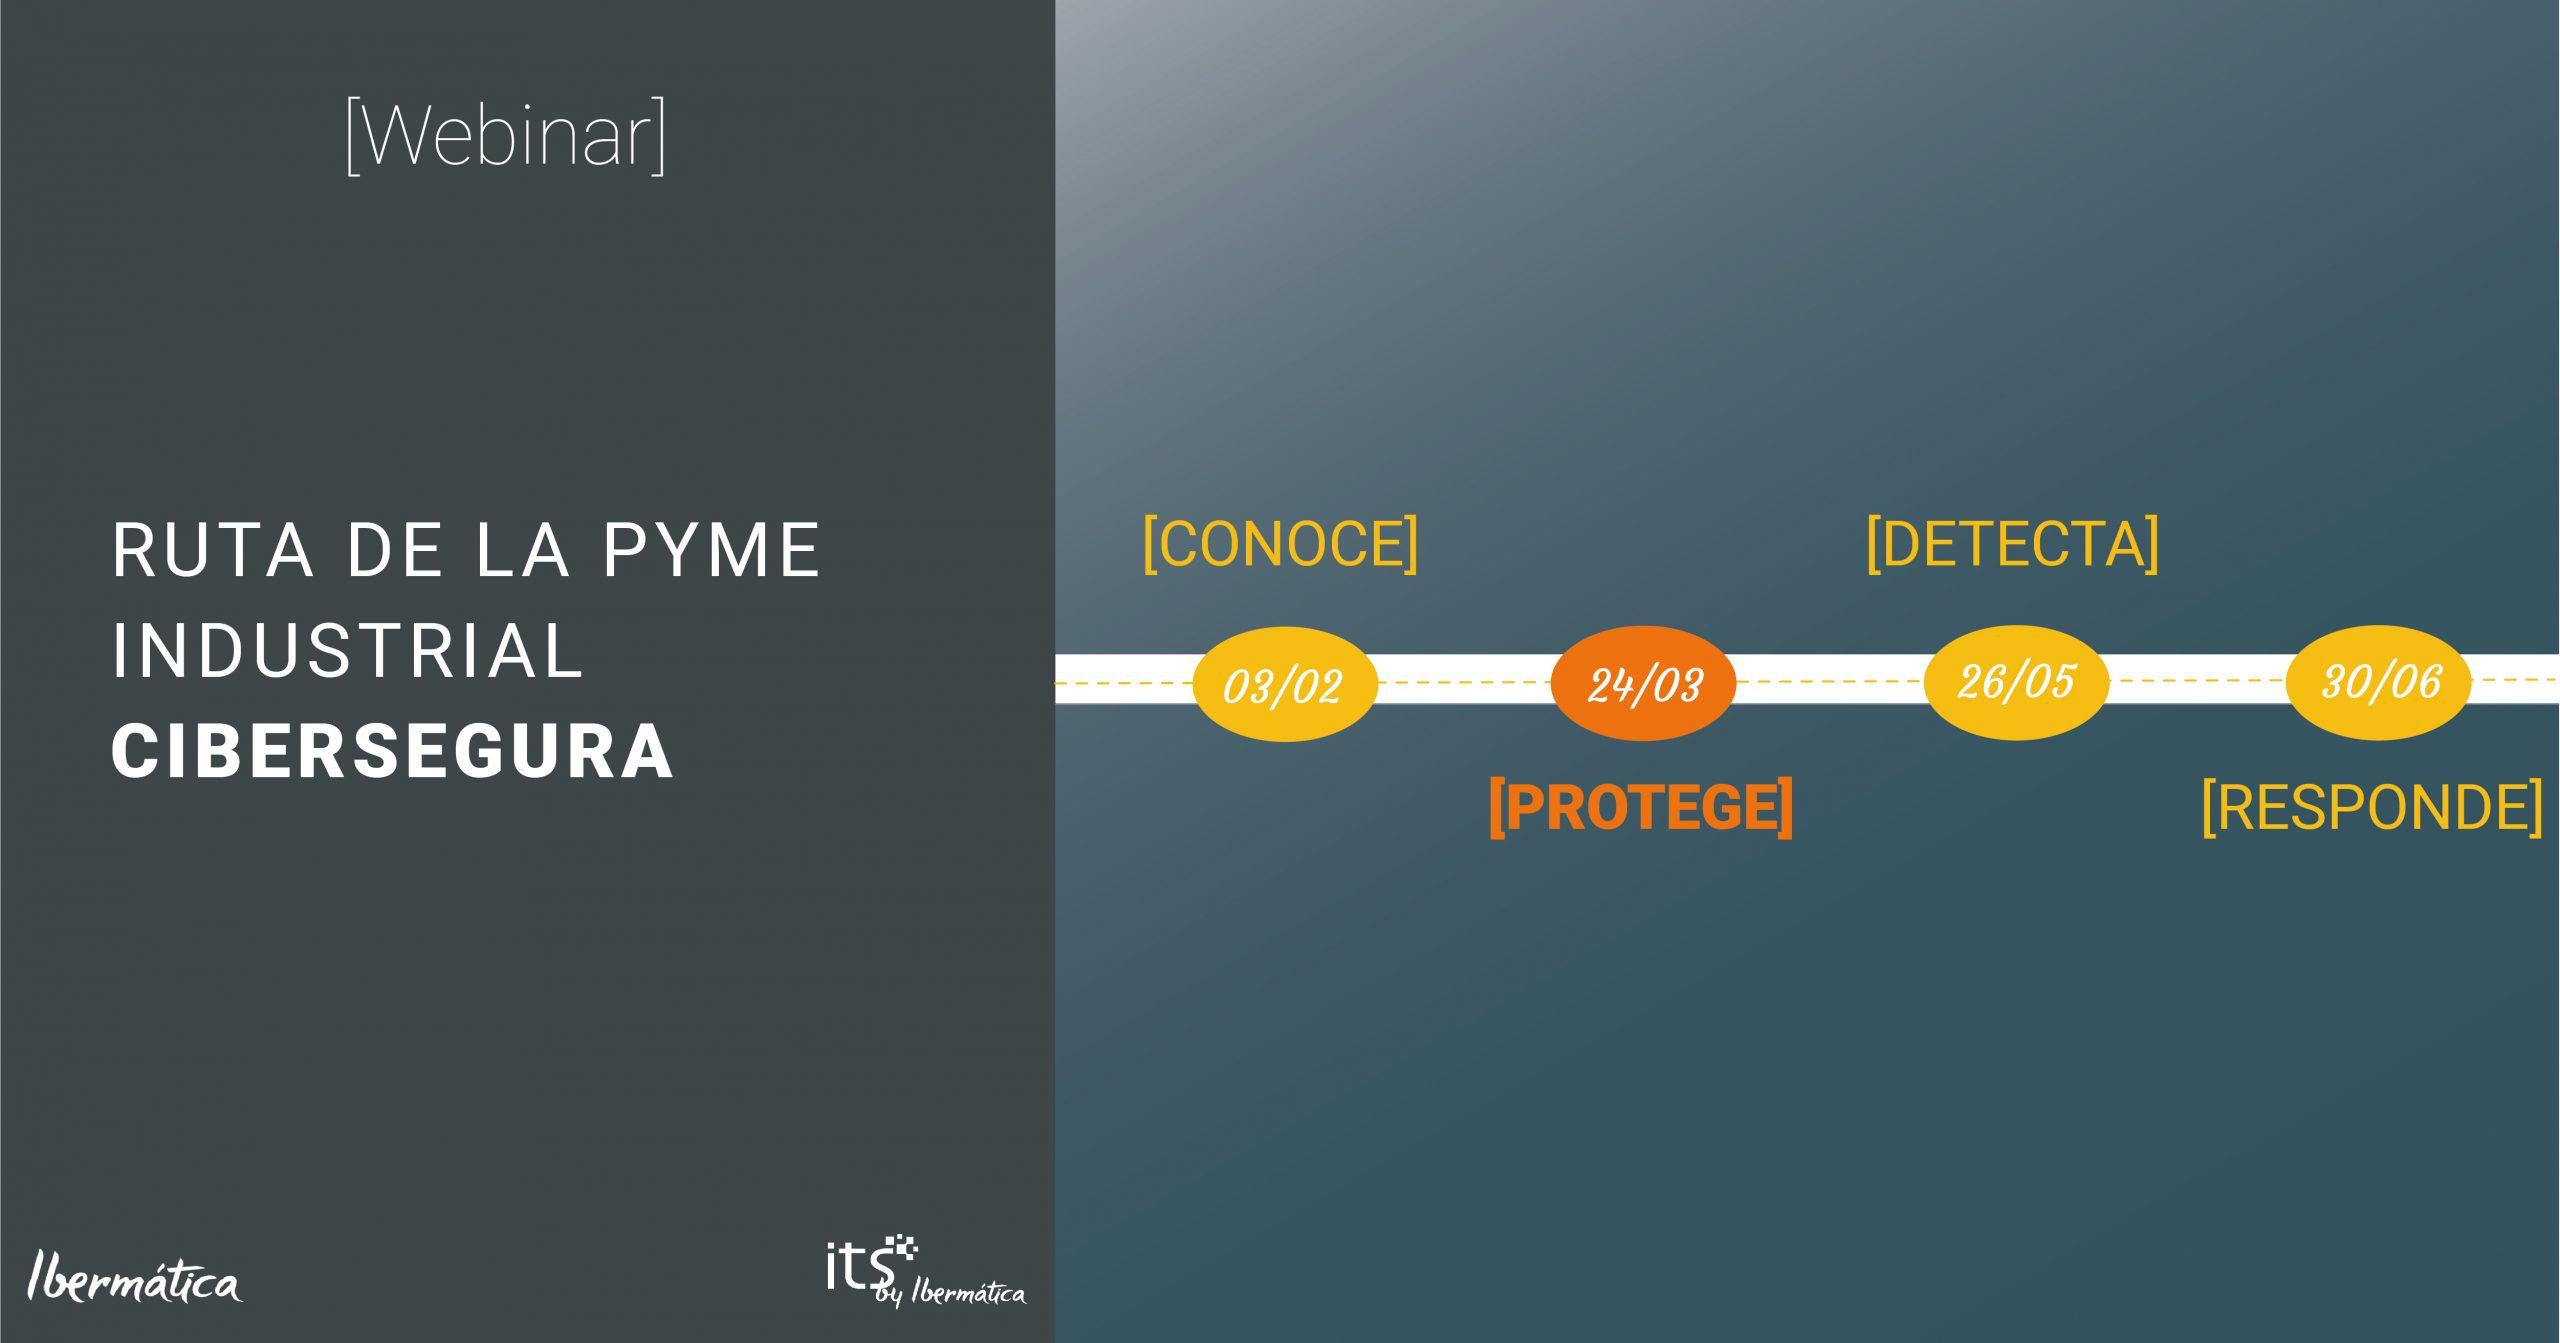 CIBER RIESGO: Ruta de la pyme industrial cibersegura: conoce y protege tus ciber riesgos.